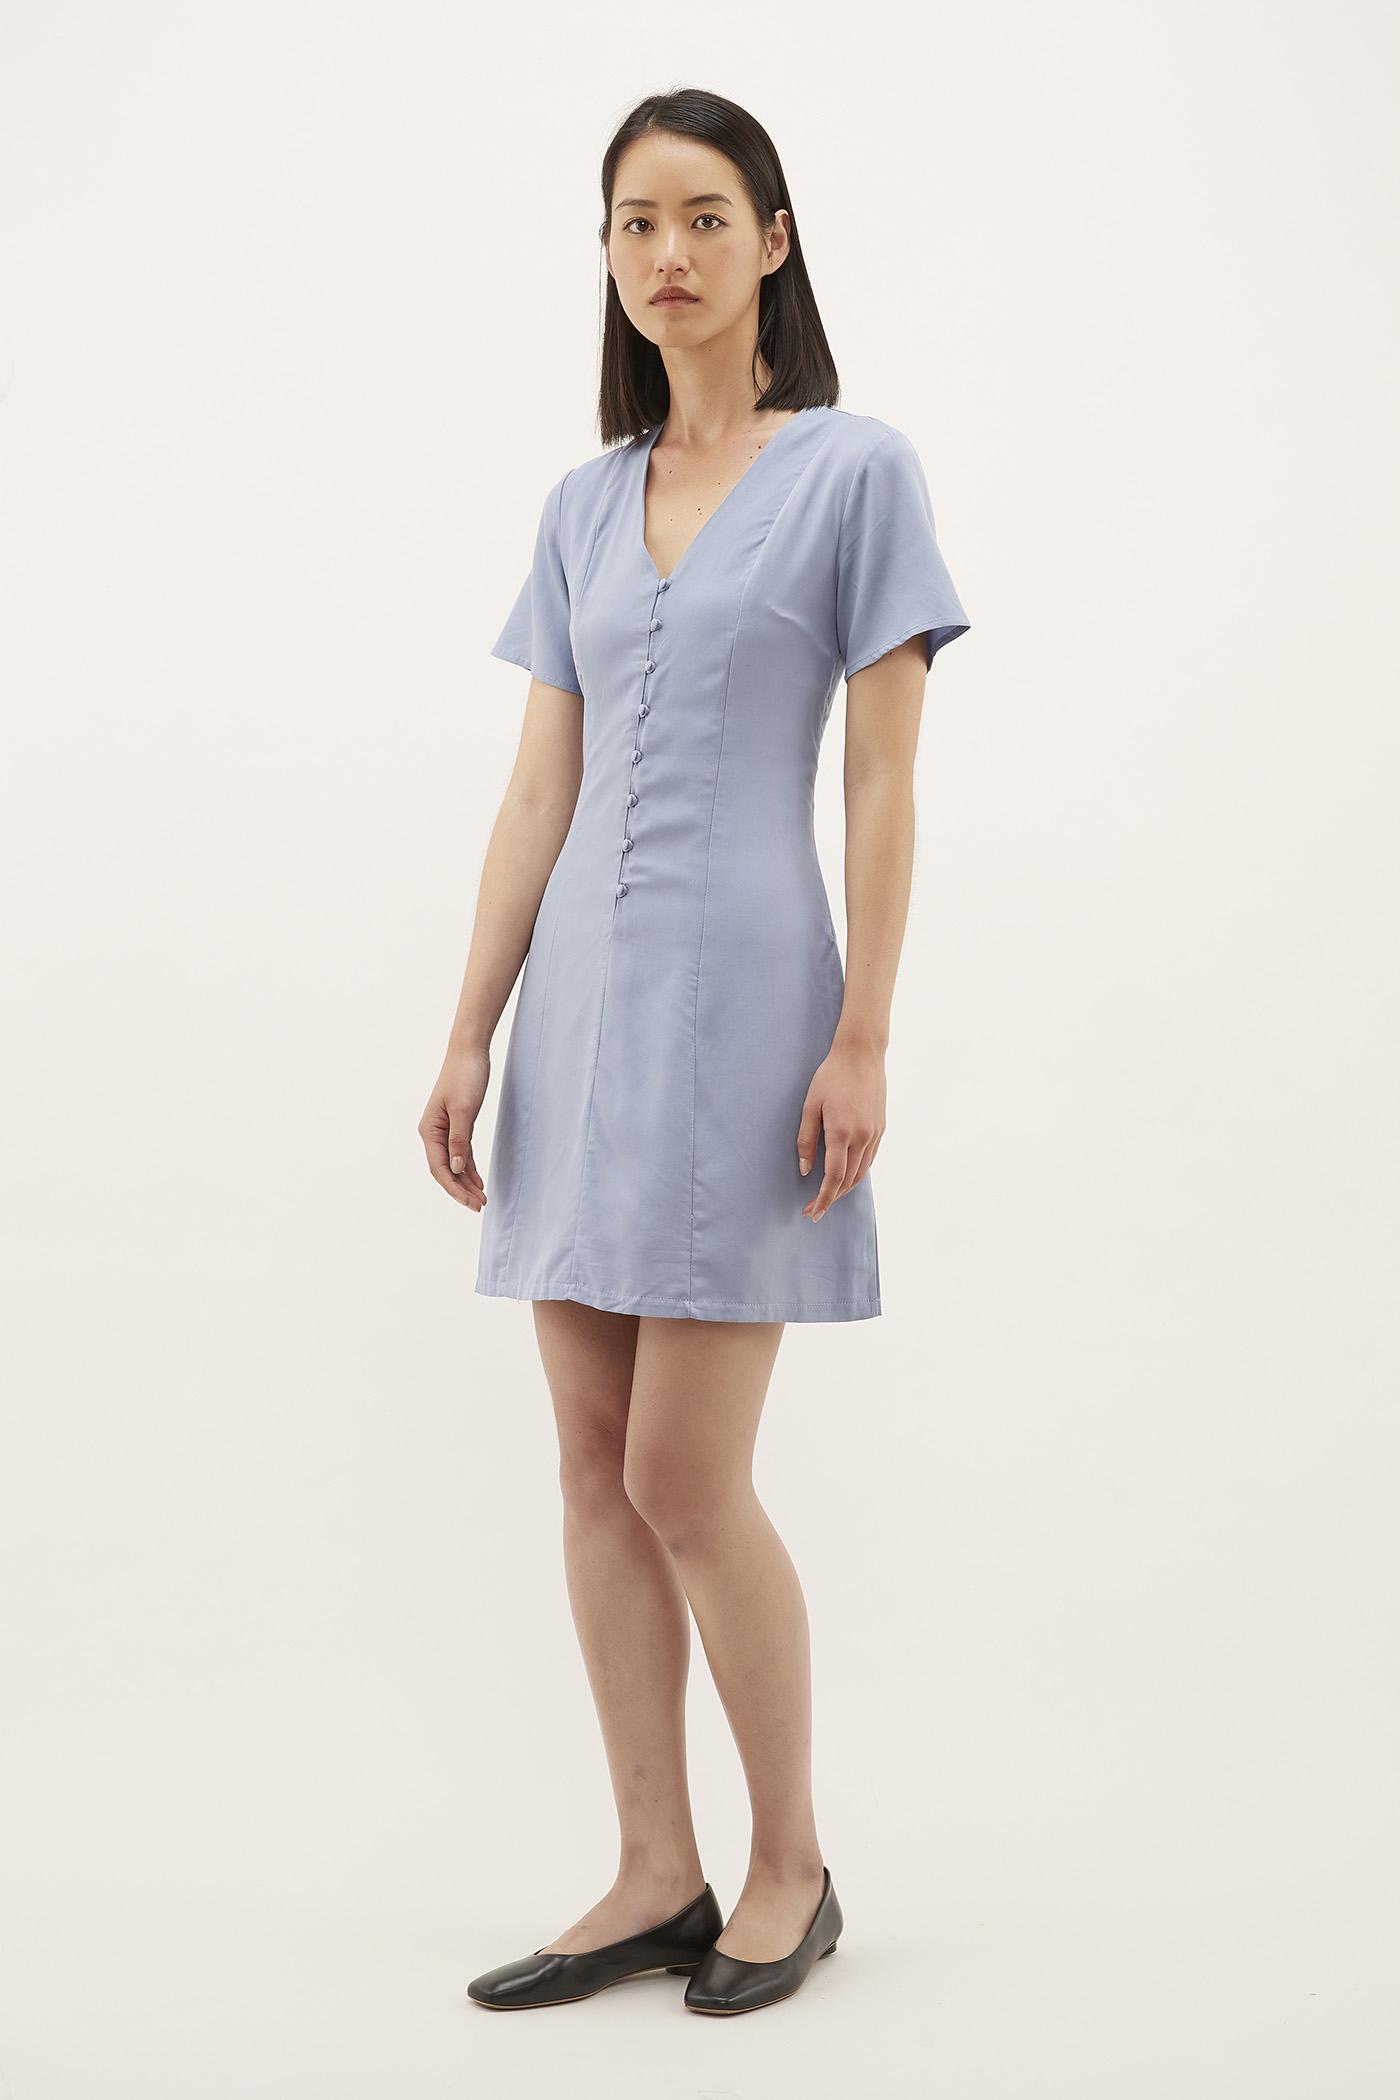 Shanley Back-laced Dress